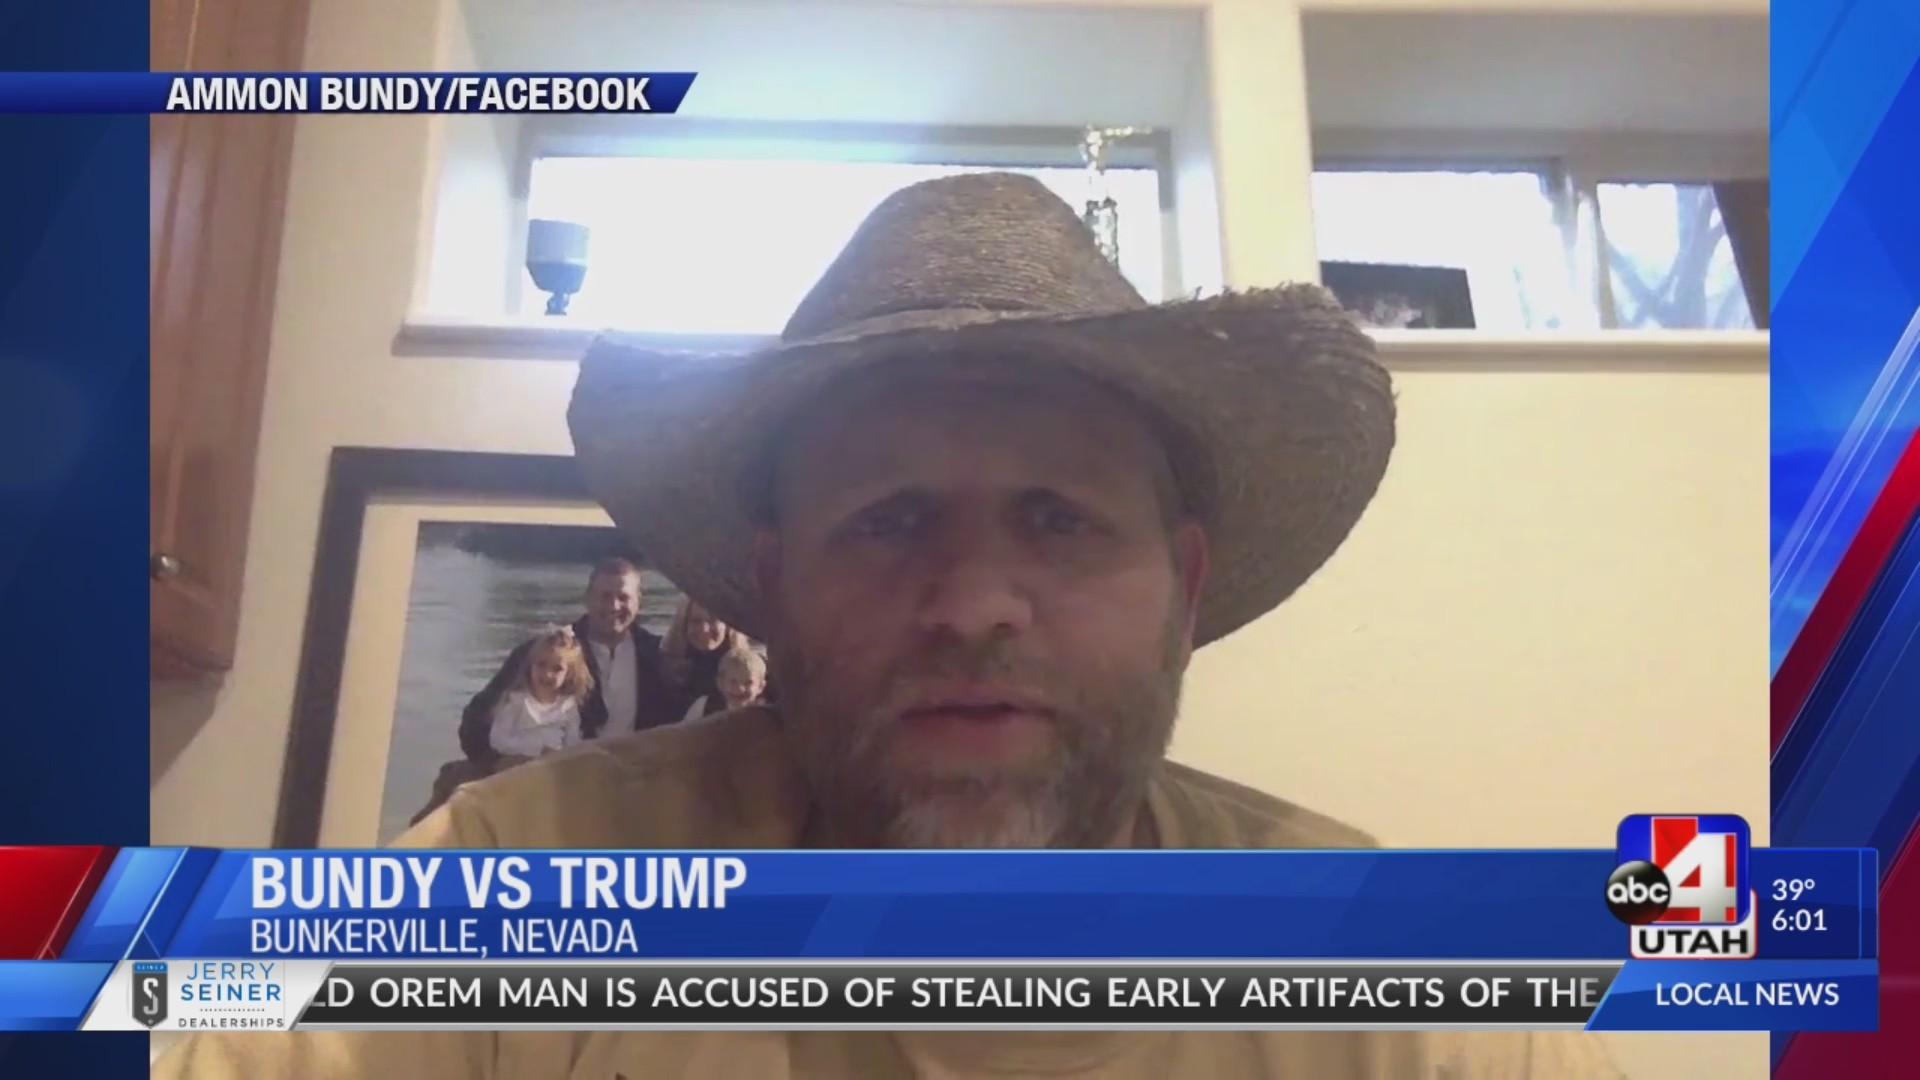 Ammon_Bundy_slams_Trump___s_anti_migrant_0_20181129020843